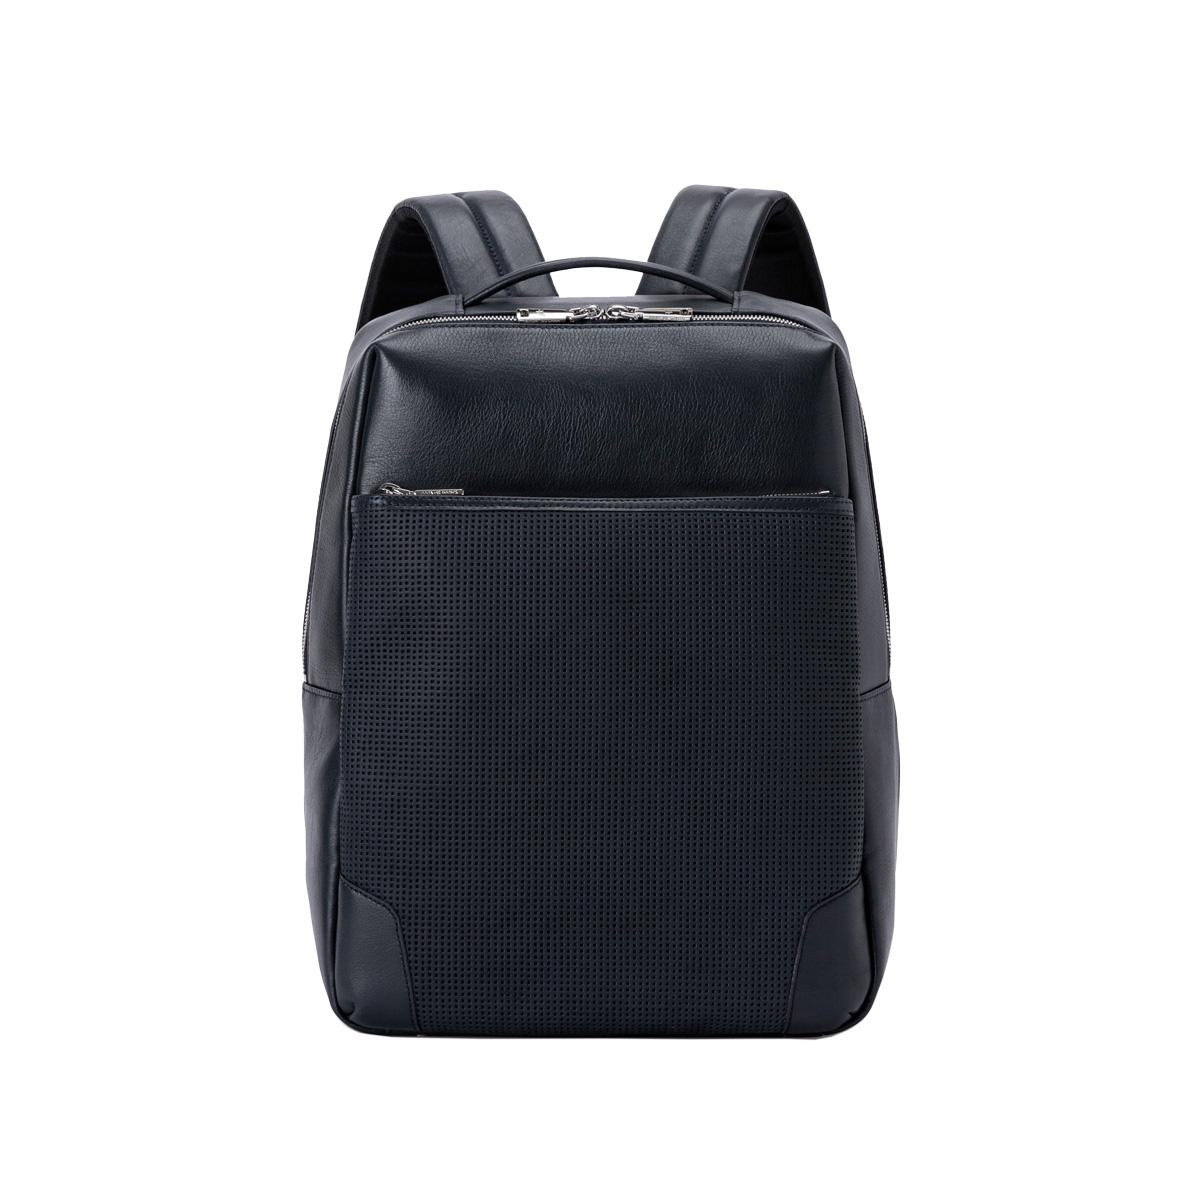 Totem Re Vooo SORE トーテムリボー リュック バッグ バックパック メンズ 豊岡鞄 グレー ネイビー TRV0706